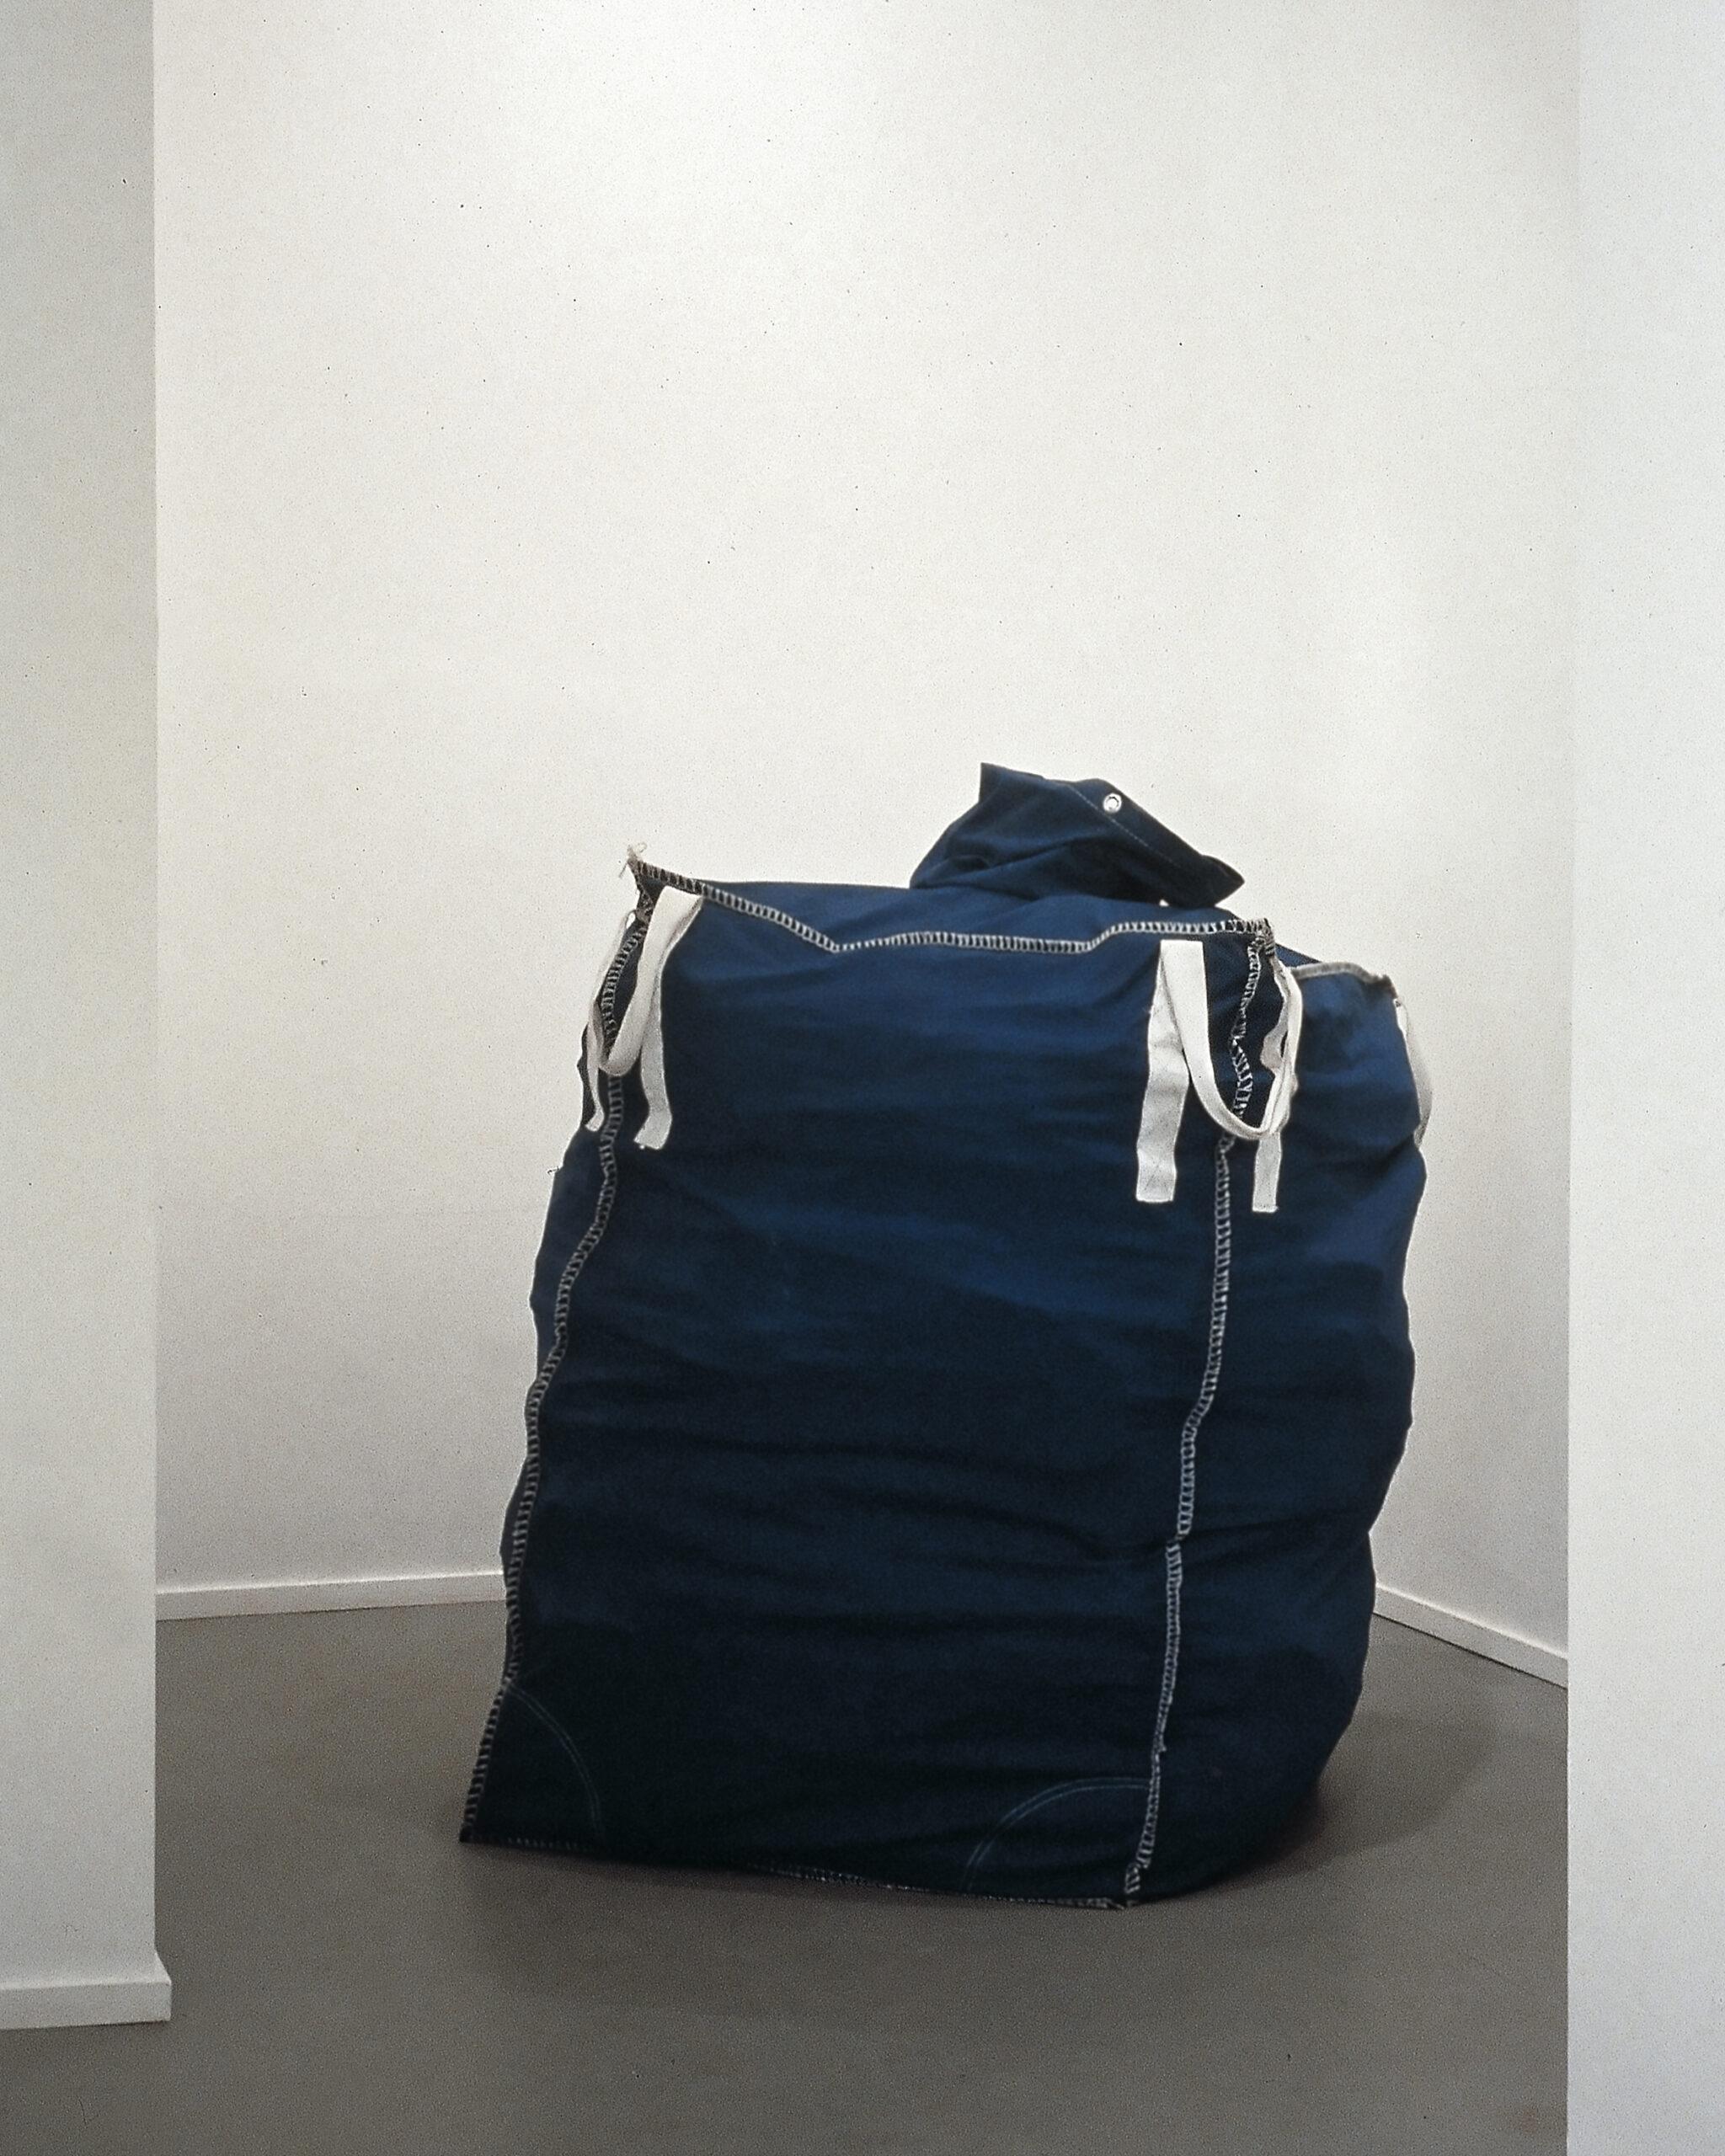 Maurizio Cattelan, Lullaby, 1994, Fabric, rubble, 135 x 85 x 85 cm  Installation view, Laure Genillard Gallery, London, 1996  Courtesy Maurizio Cattelan's Archive